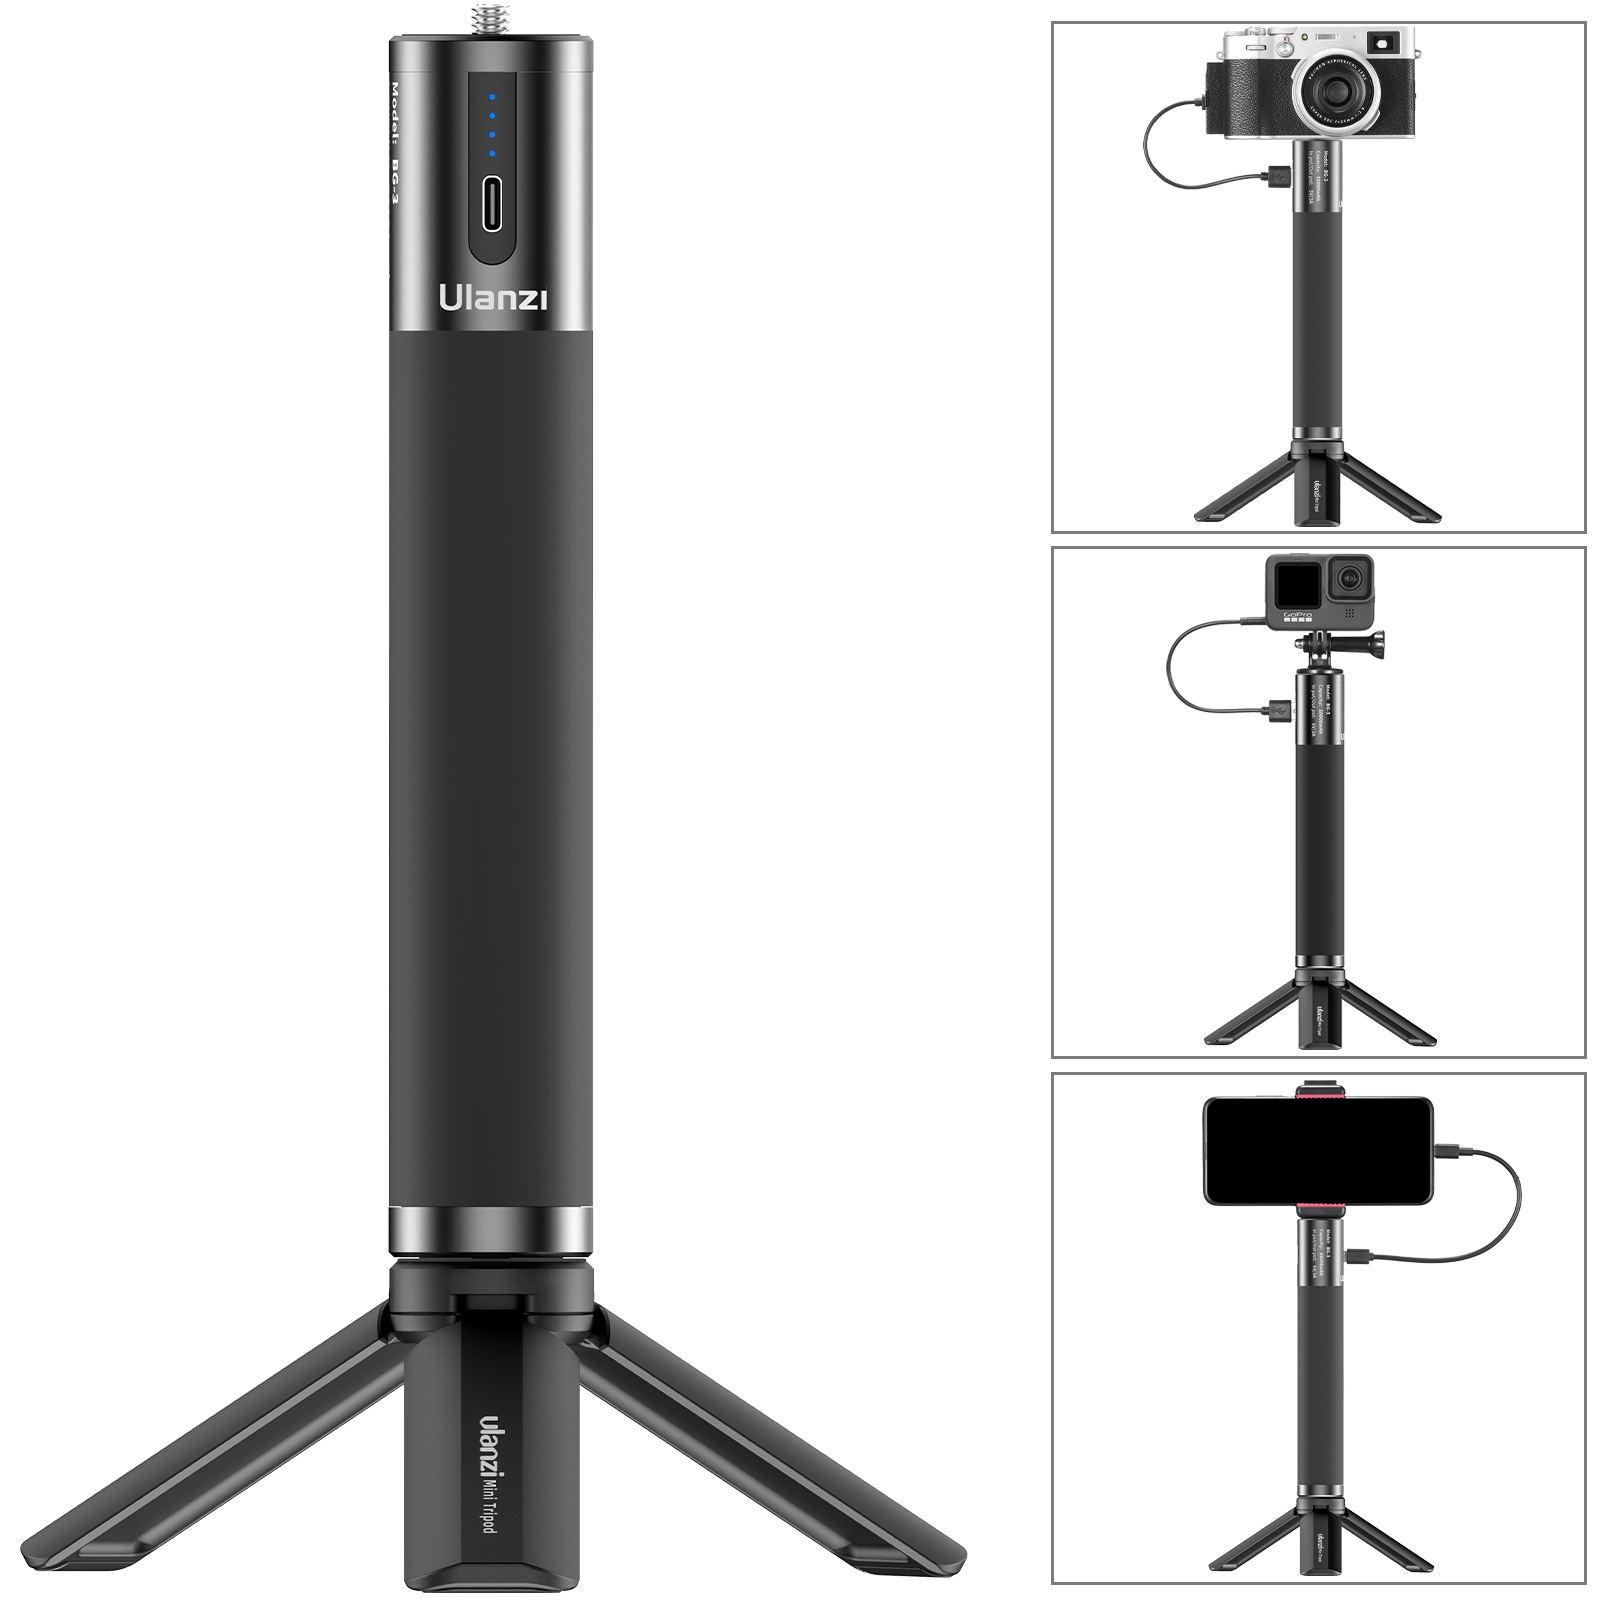 BG-3 1000mAh Mobile Charging Handle Multifunctional Portable Power Bank for Photography and Video black